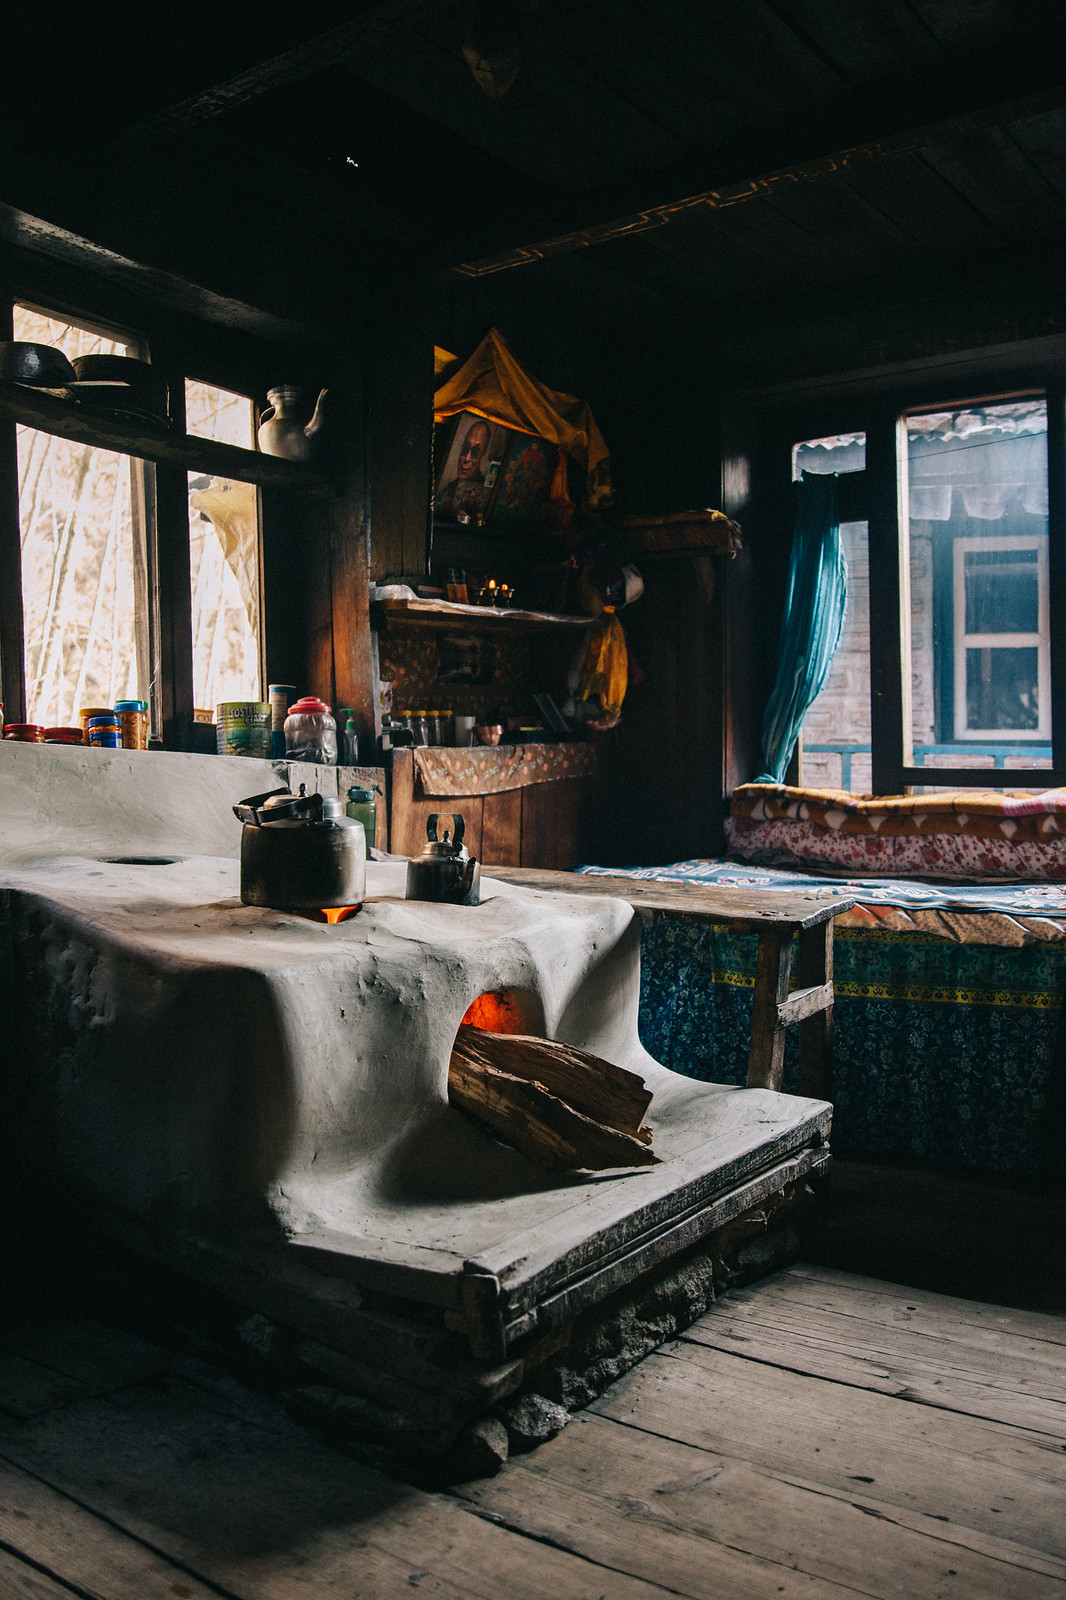 Nepal Lama Hotel